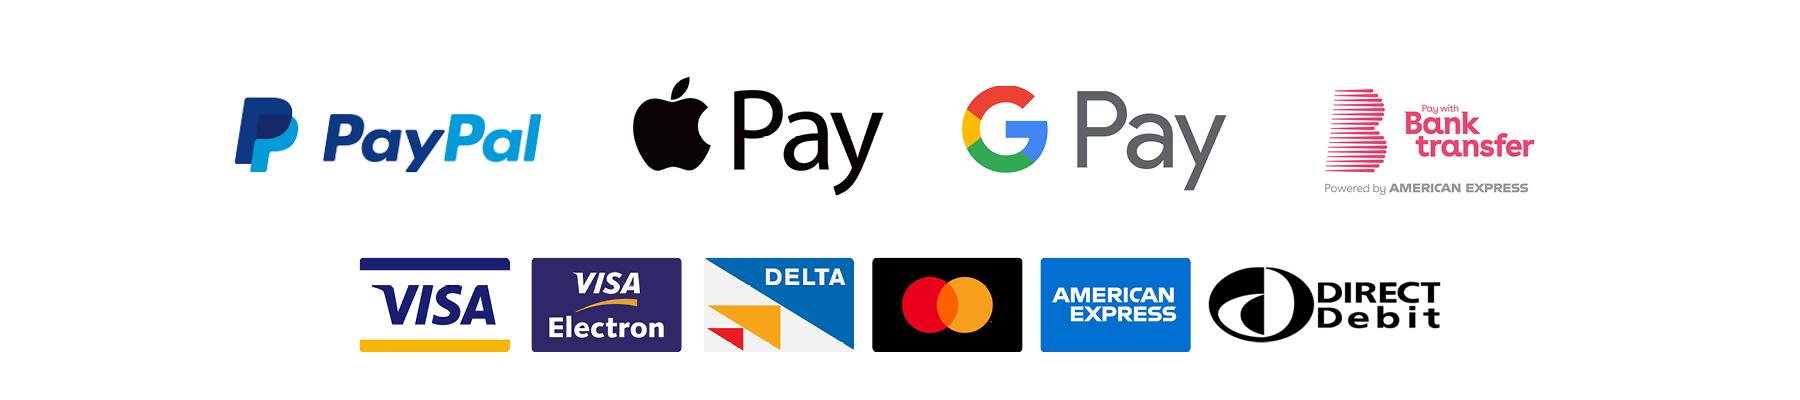 gc_landingpage_payments